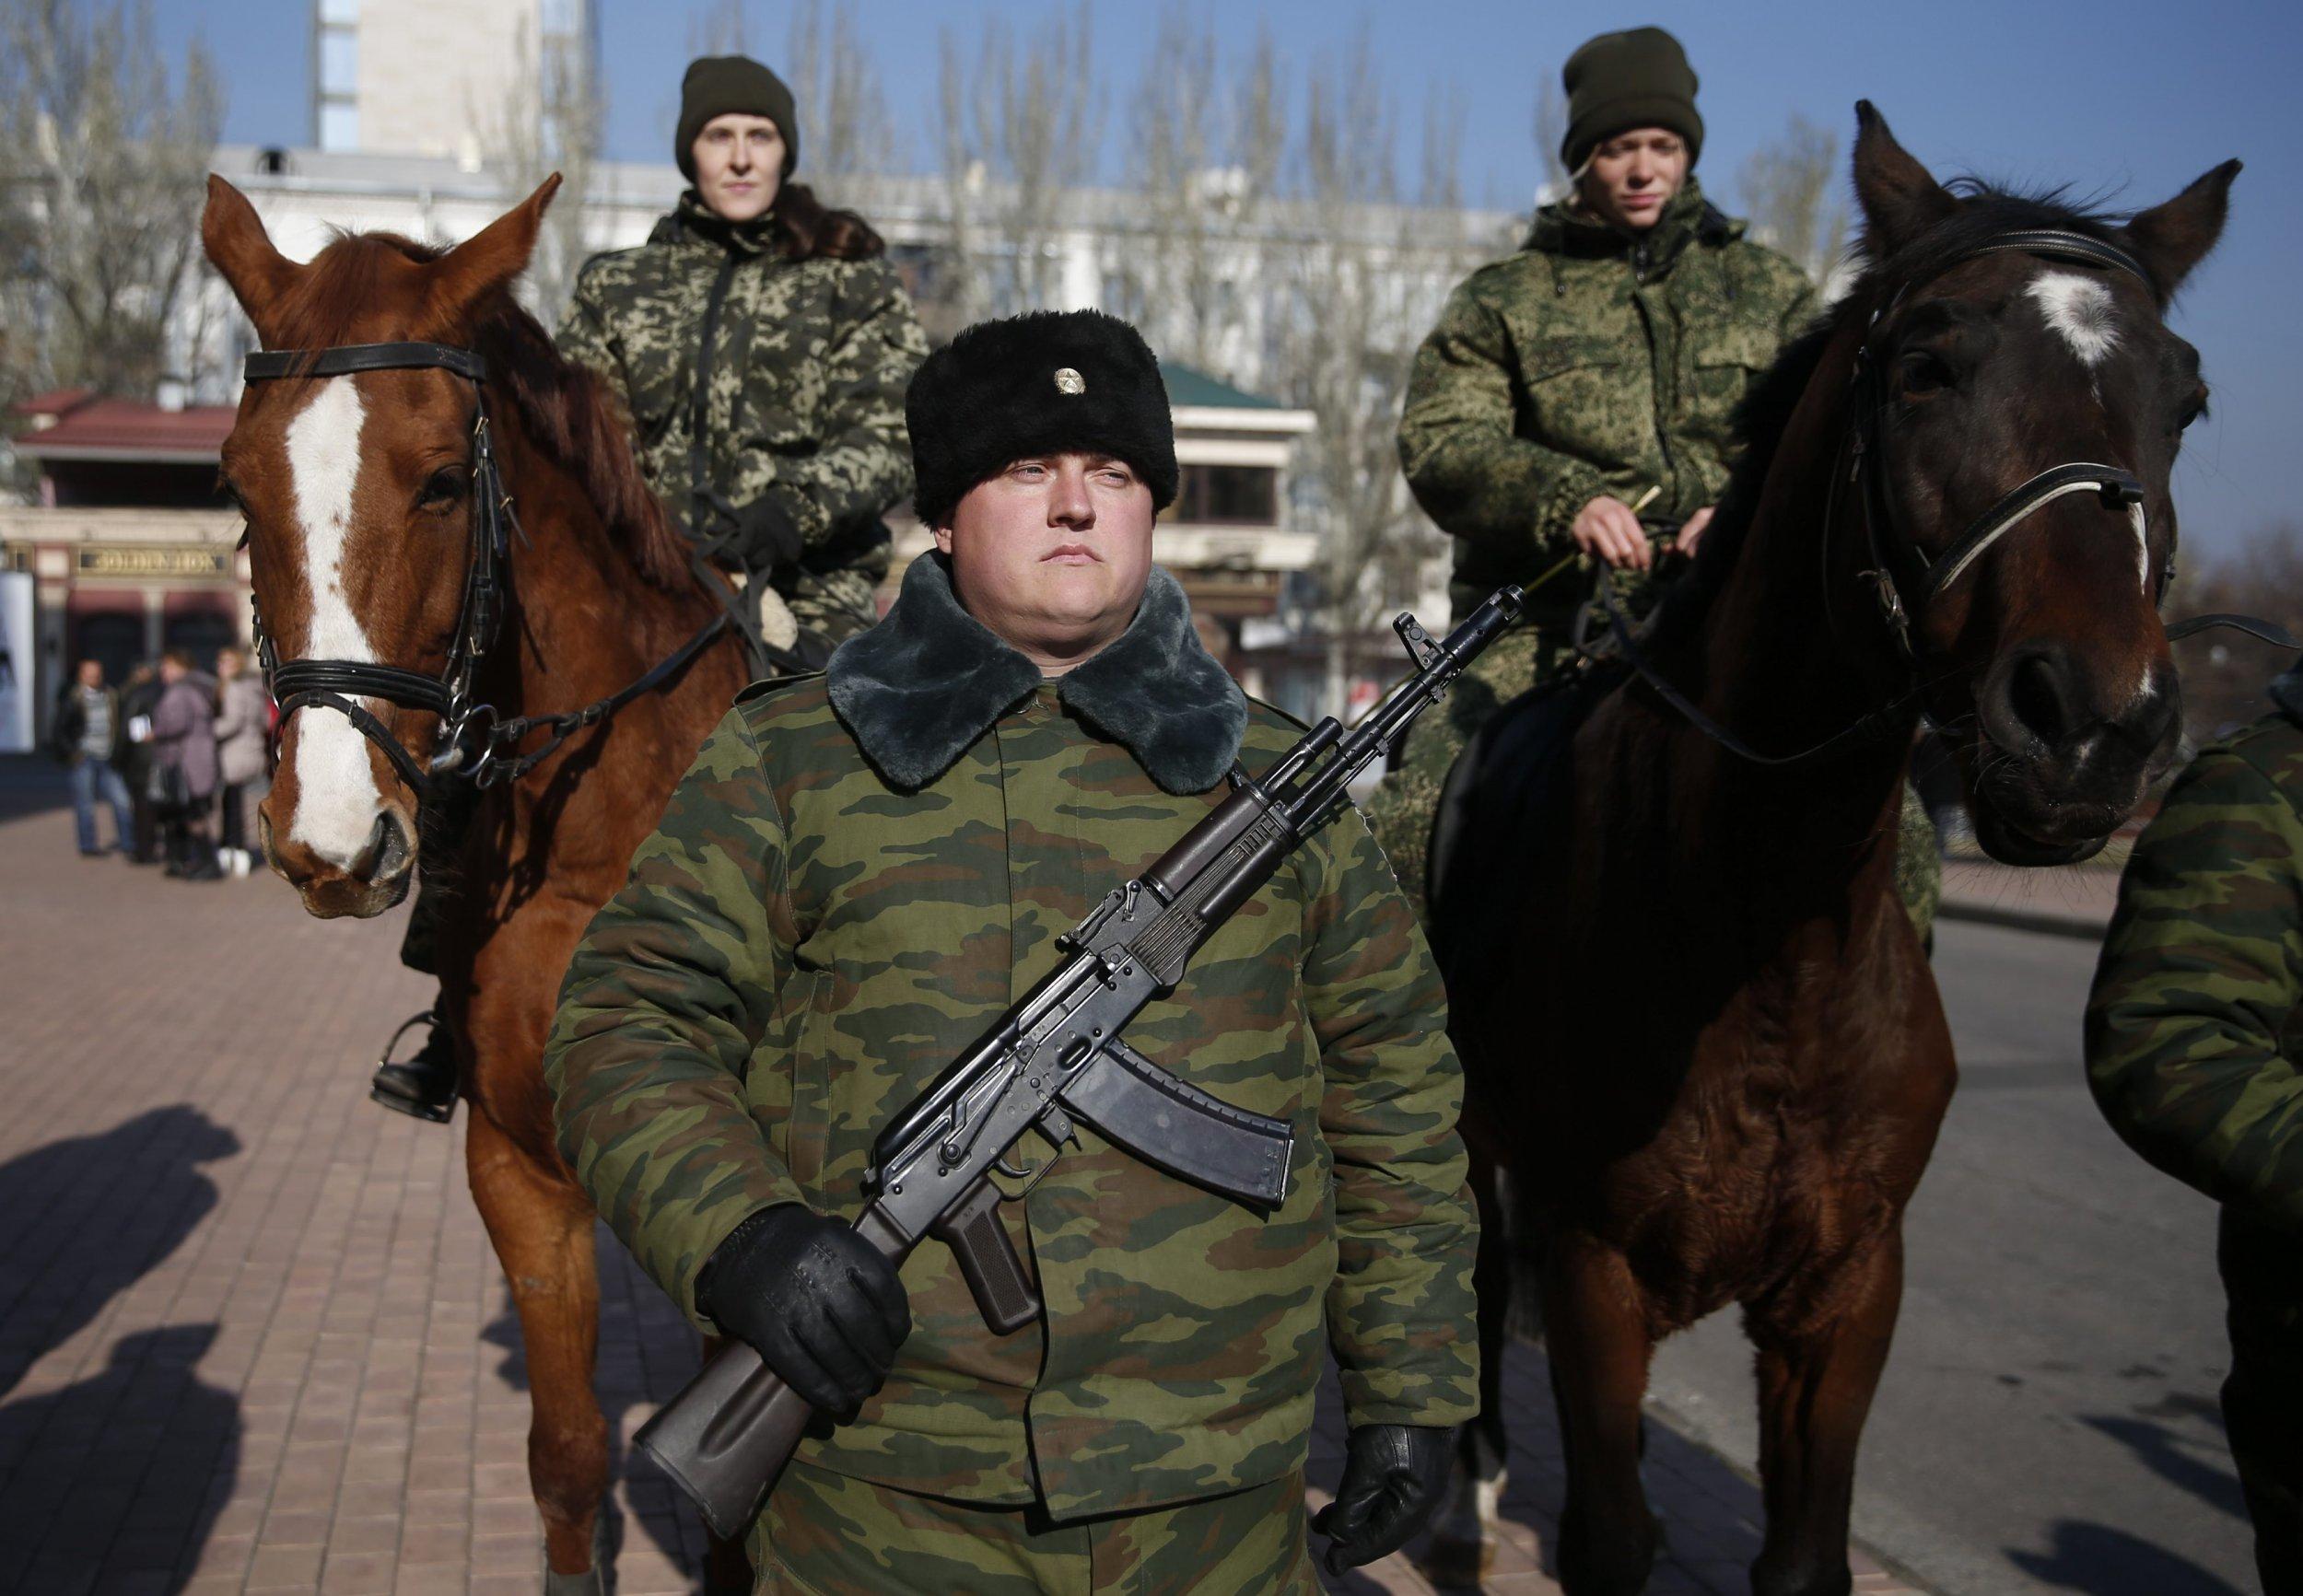 2014-11-04T130922Z_1203584719_GM1EAB41MNW01_RTRMADP_3_UKRAINE-CRISIS-REBEL-CEREMONY